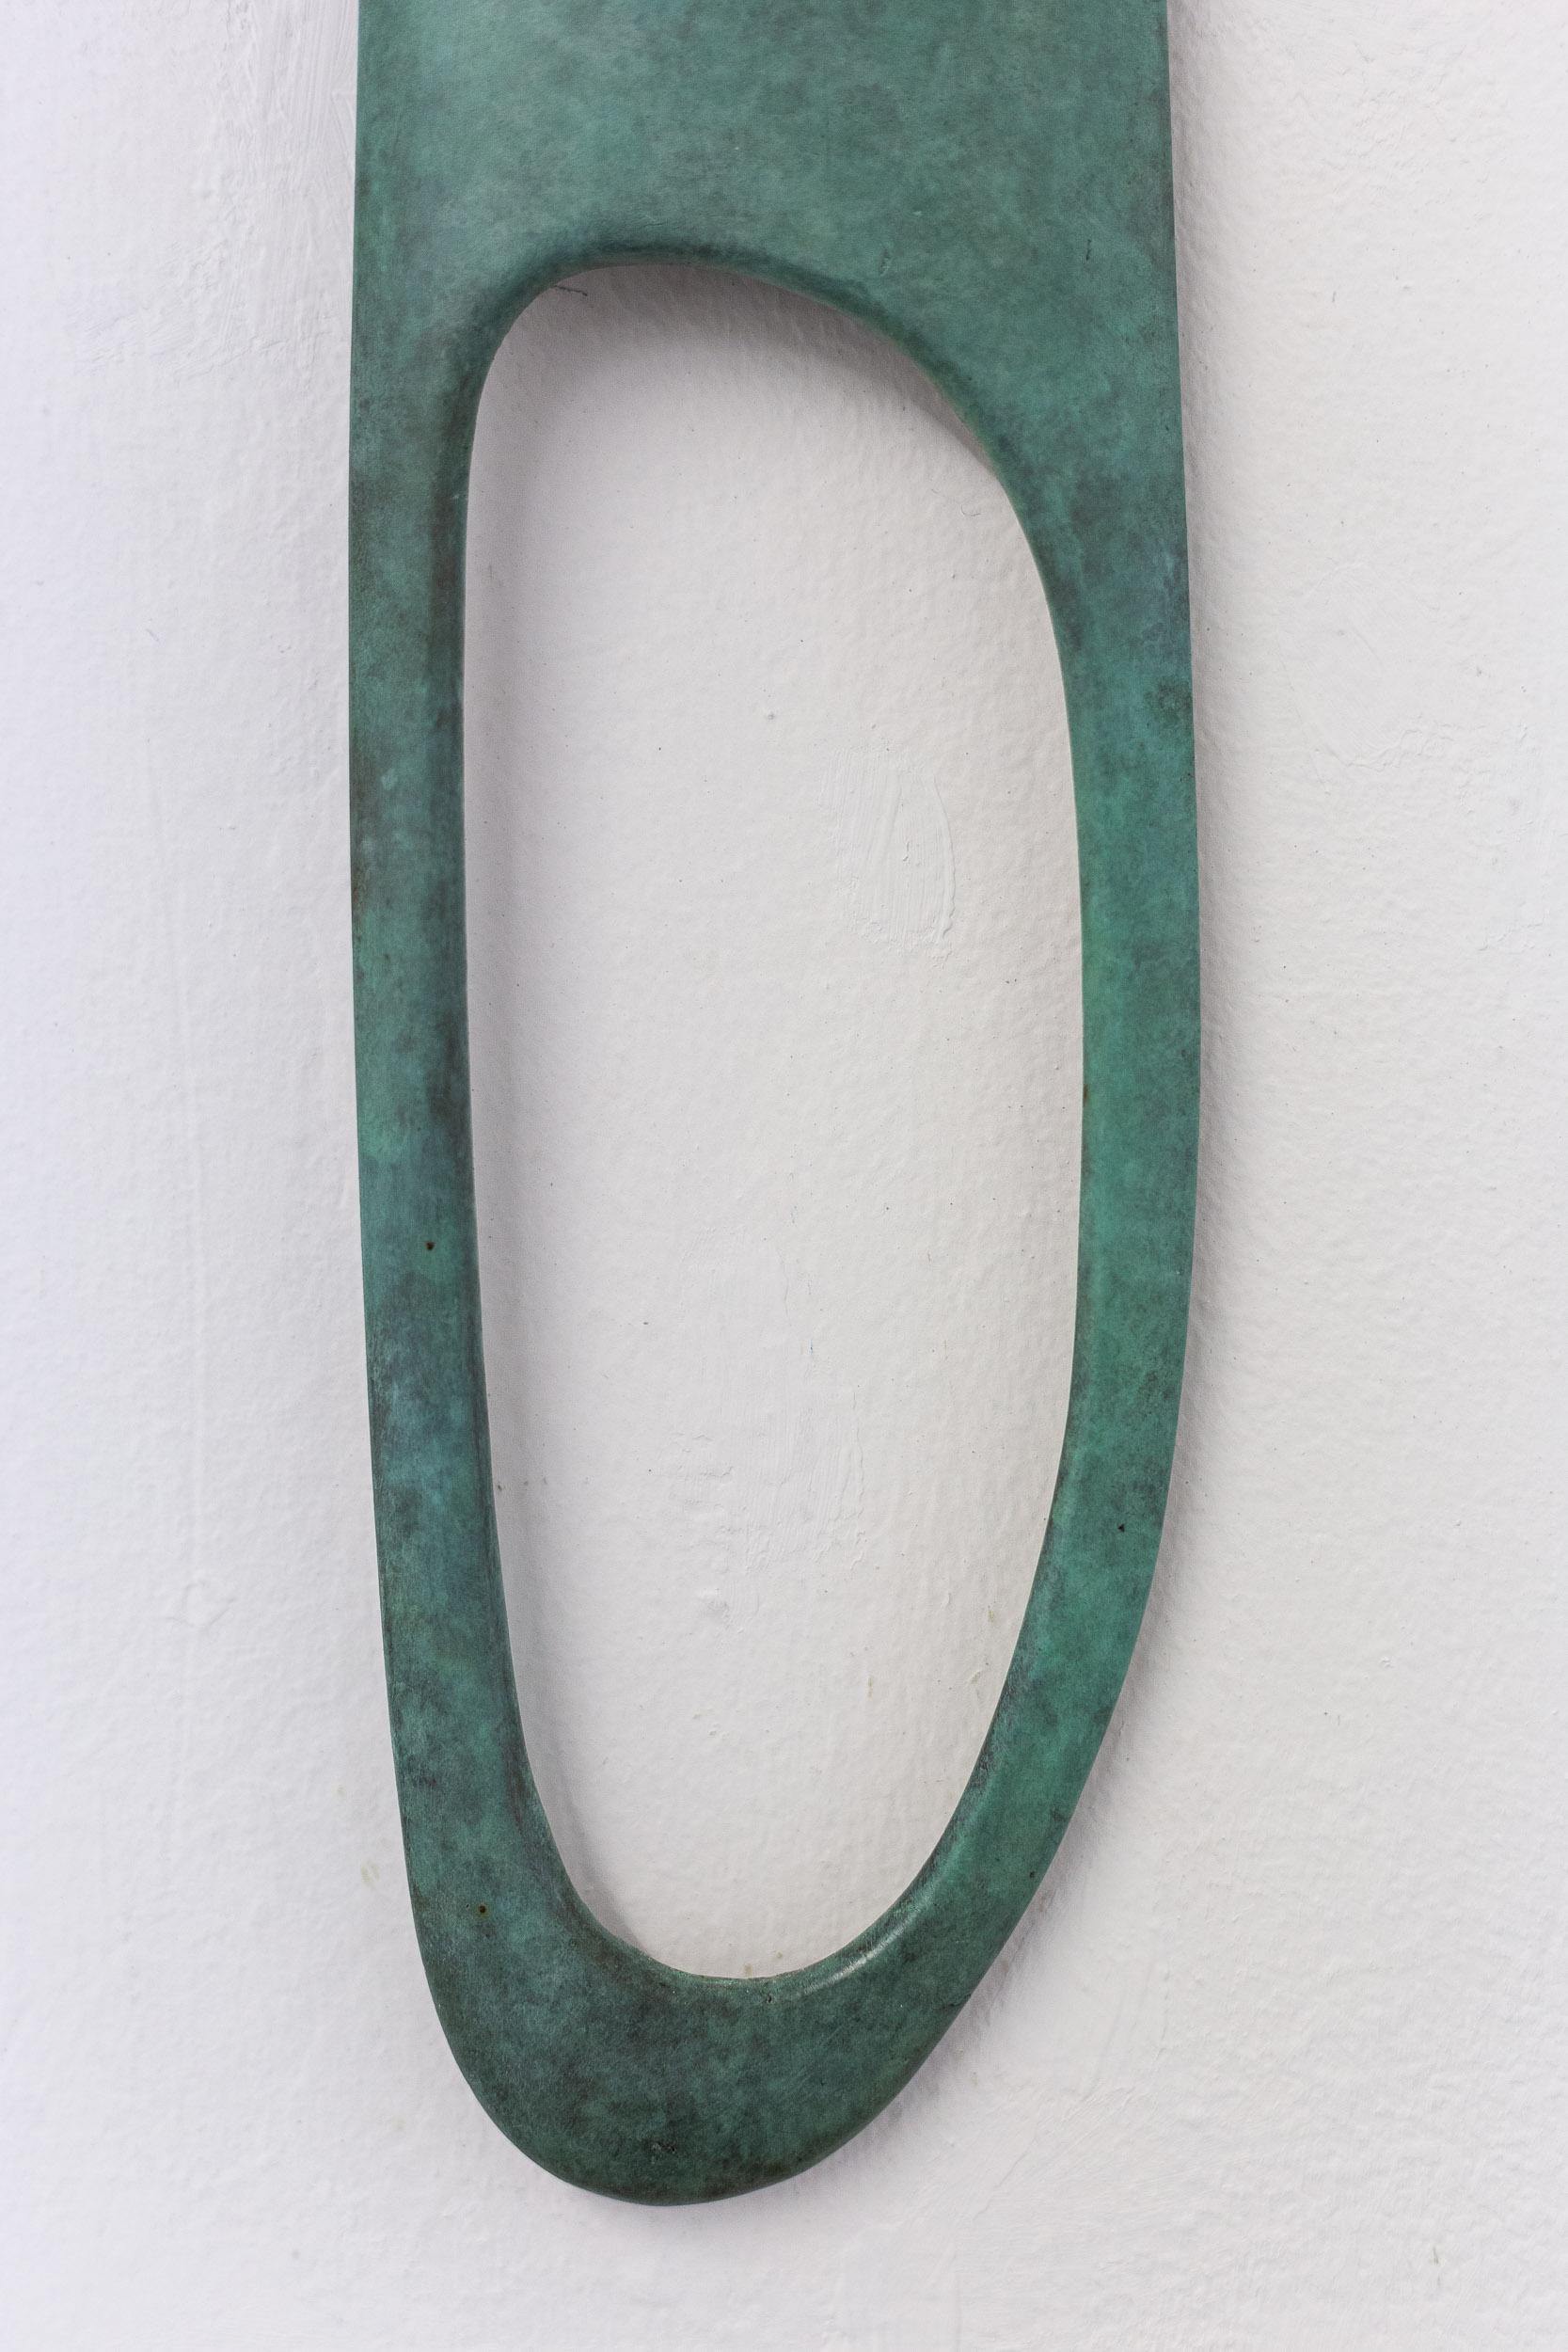 Alfredo Aceto,  Untitled LEFT  (Punctuations) (detail), 2018, cast bronze, 40 x 15 x 5 cm  Photo: Kilian Bannwart